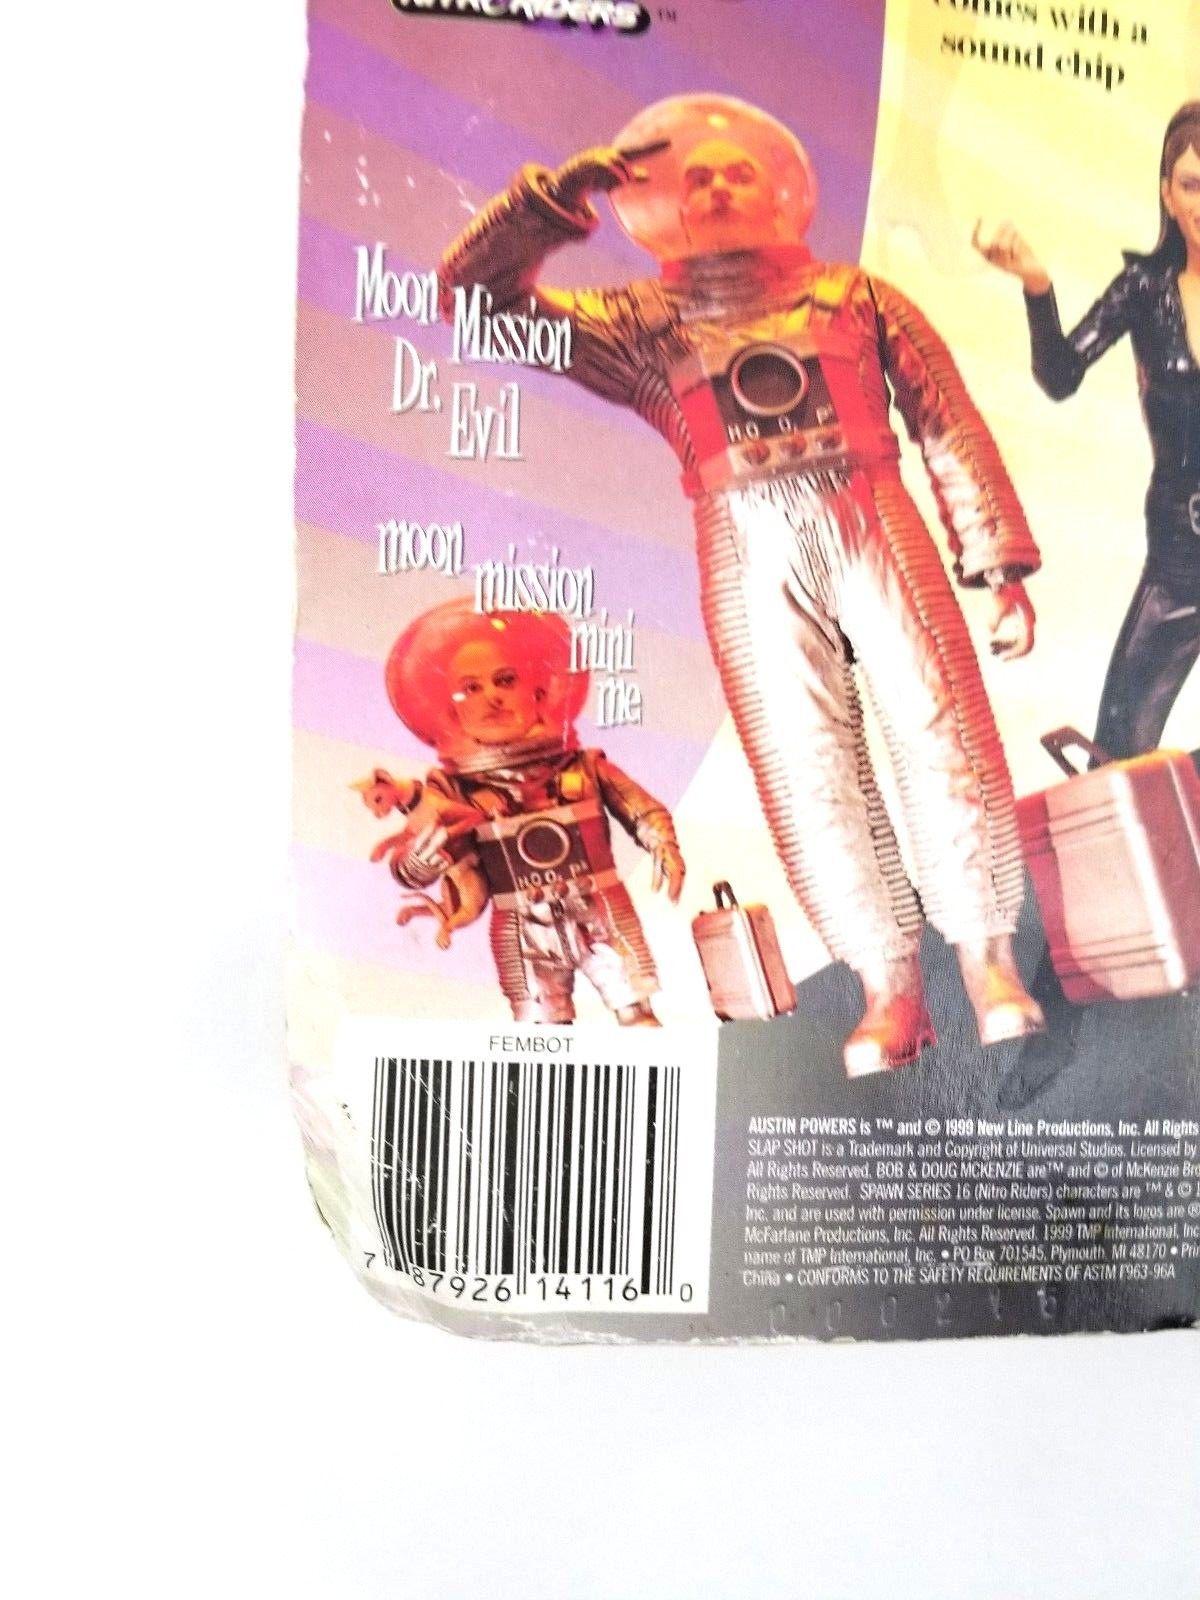 Austin Powers Figures Feature Film Series 2 Fembot Figure McFarlane Toys 1999